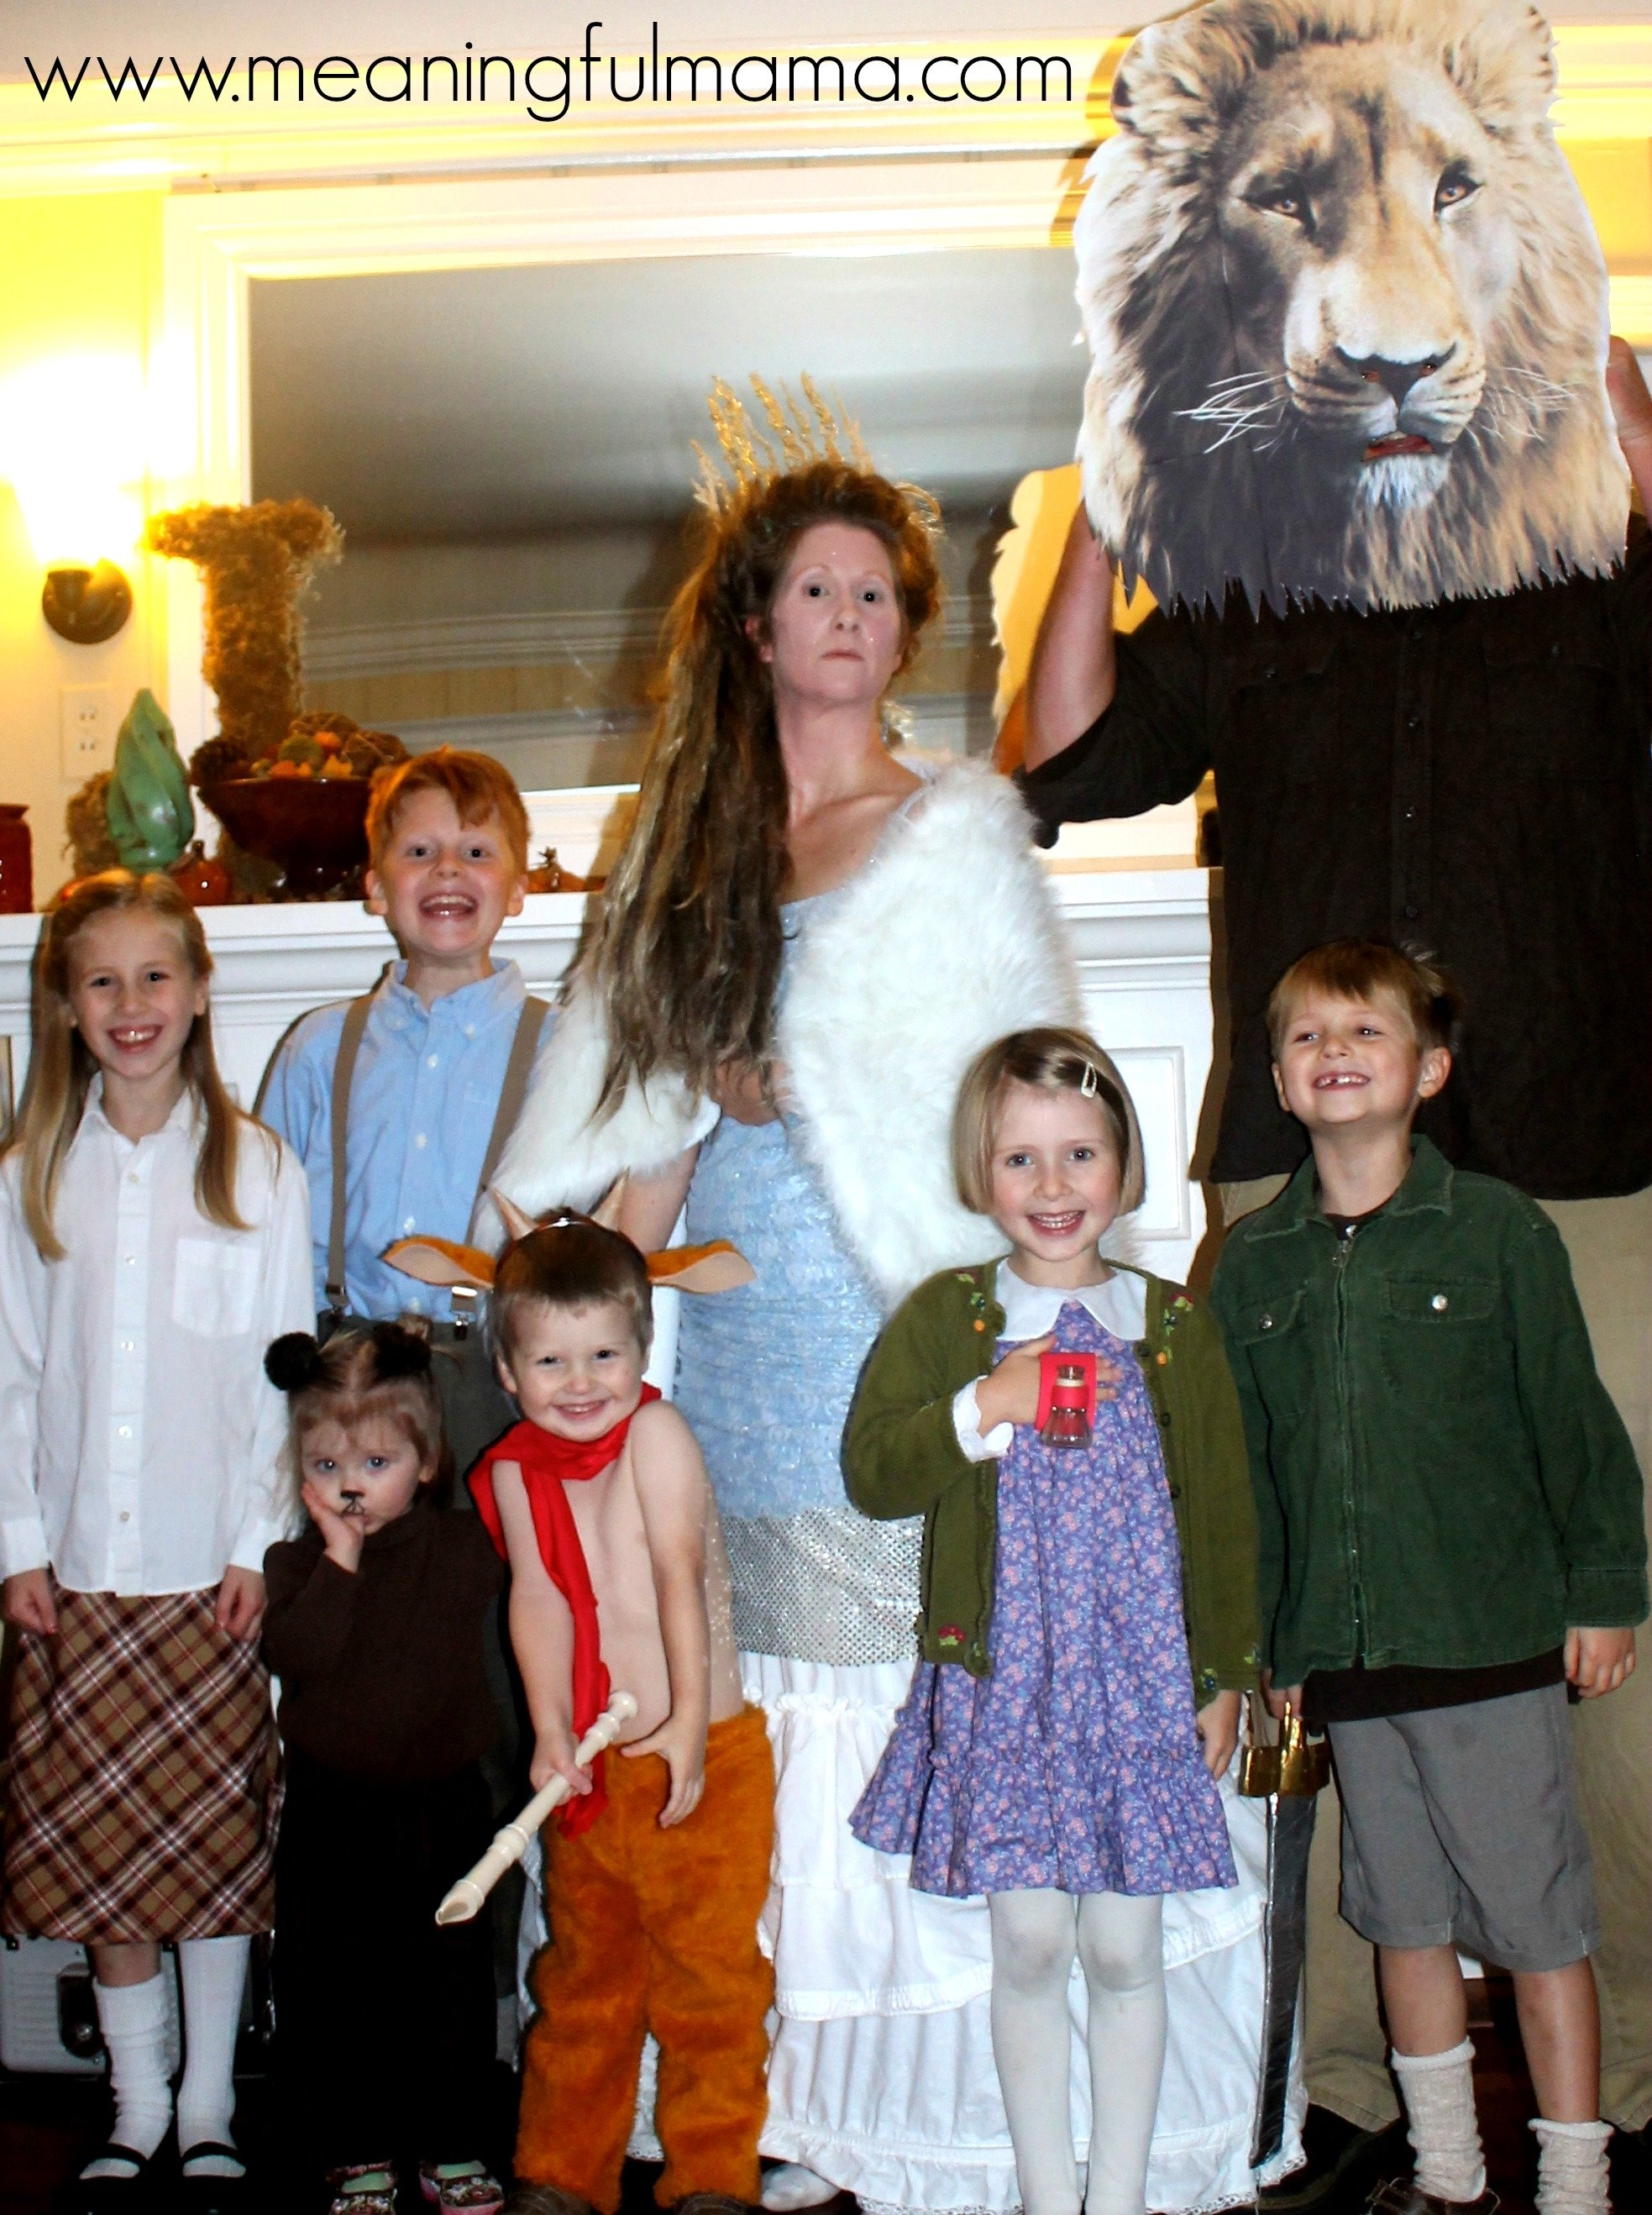 10 Stunning Halloween Costume Ideas For 2013 15 creative family costume ideas 2 2020